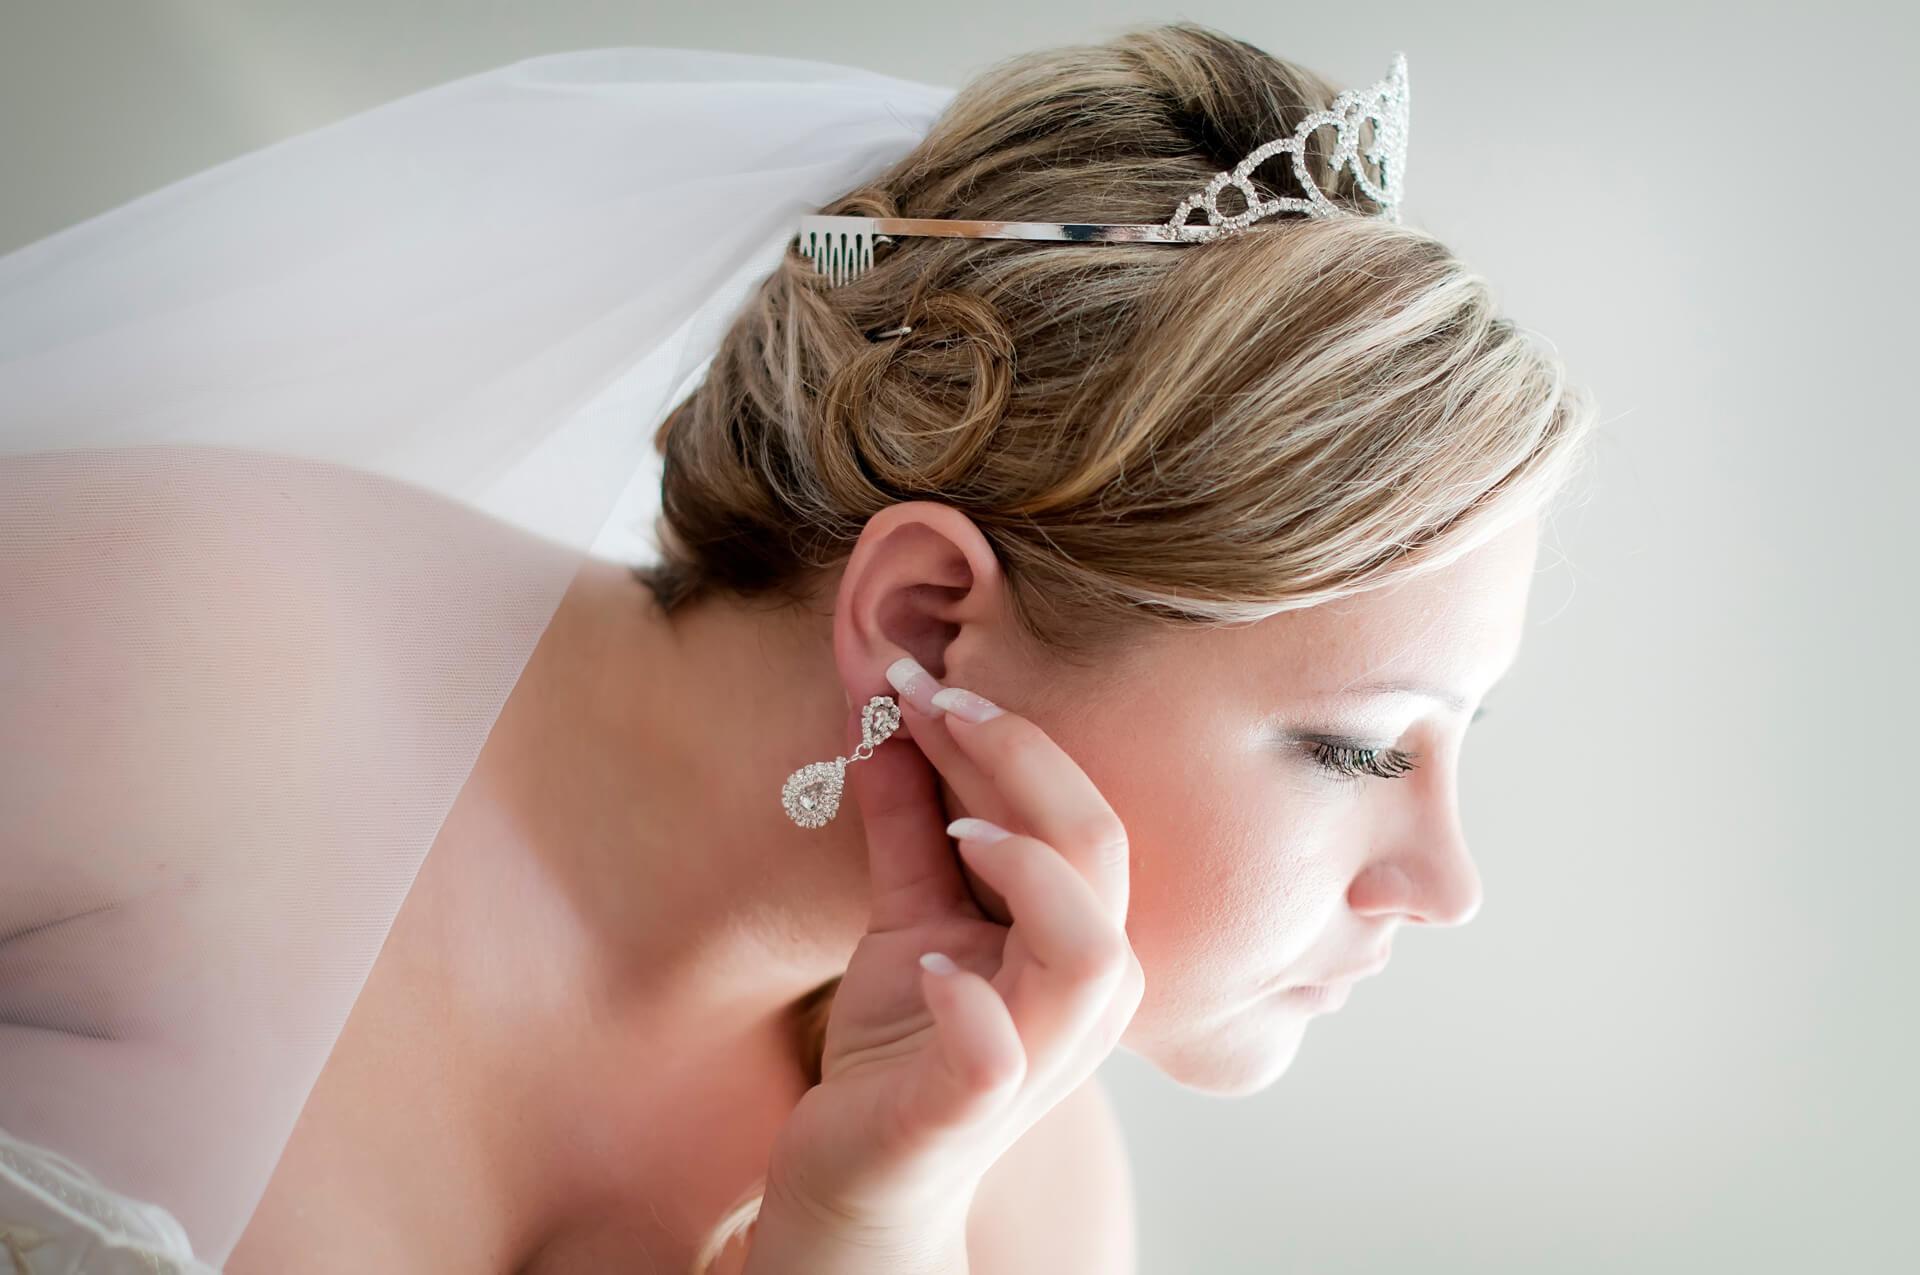 svadba svadobny pripravy profesionalne fotenie fotograf Peter Norulak Kosice__01